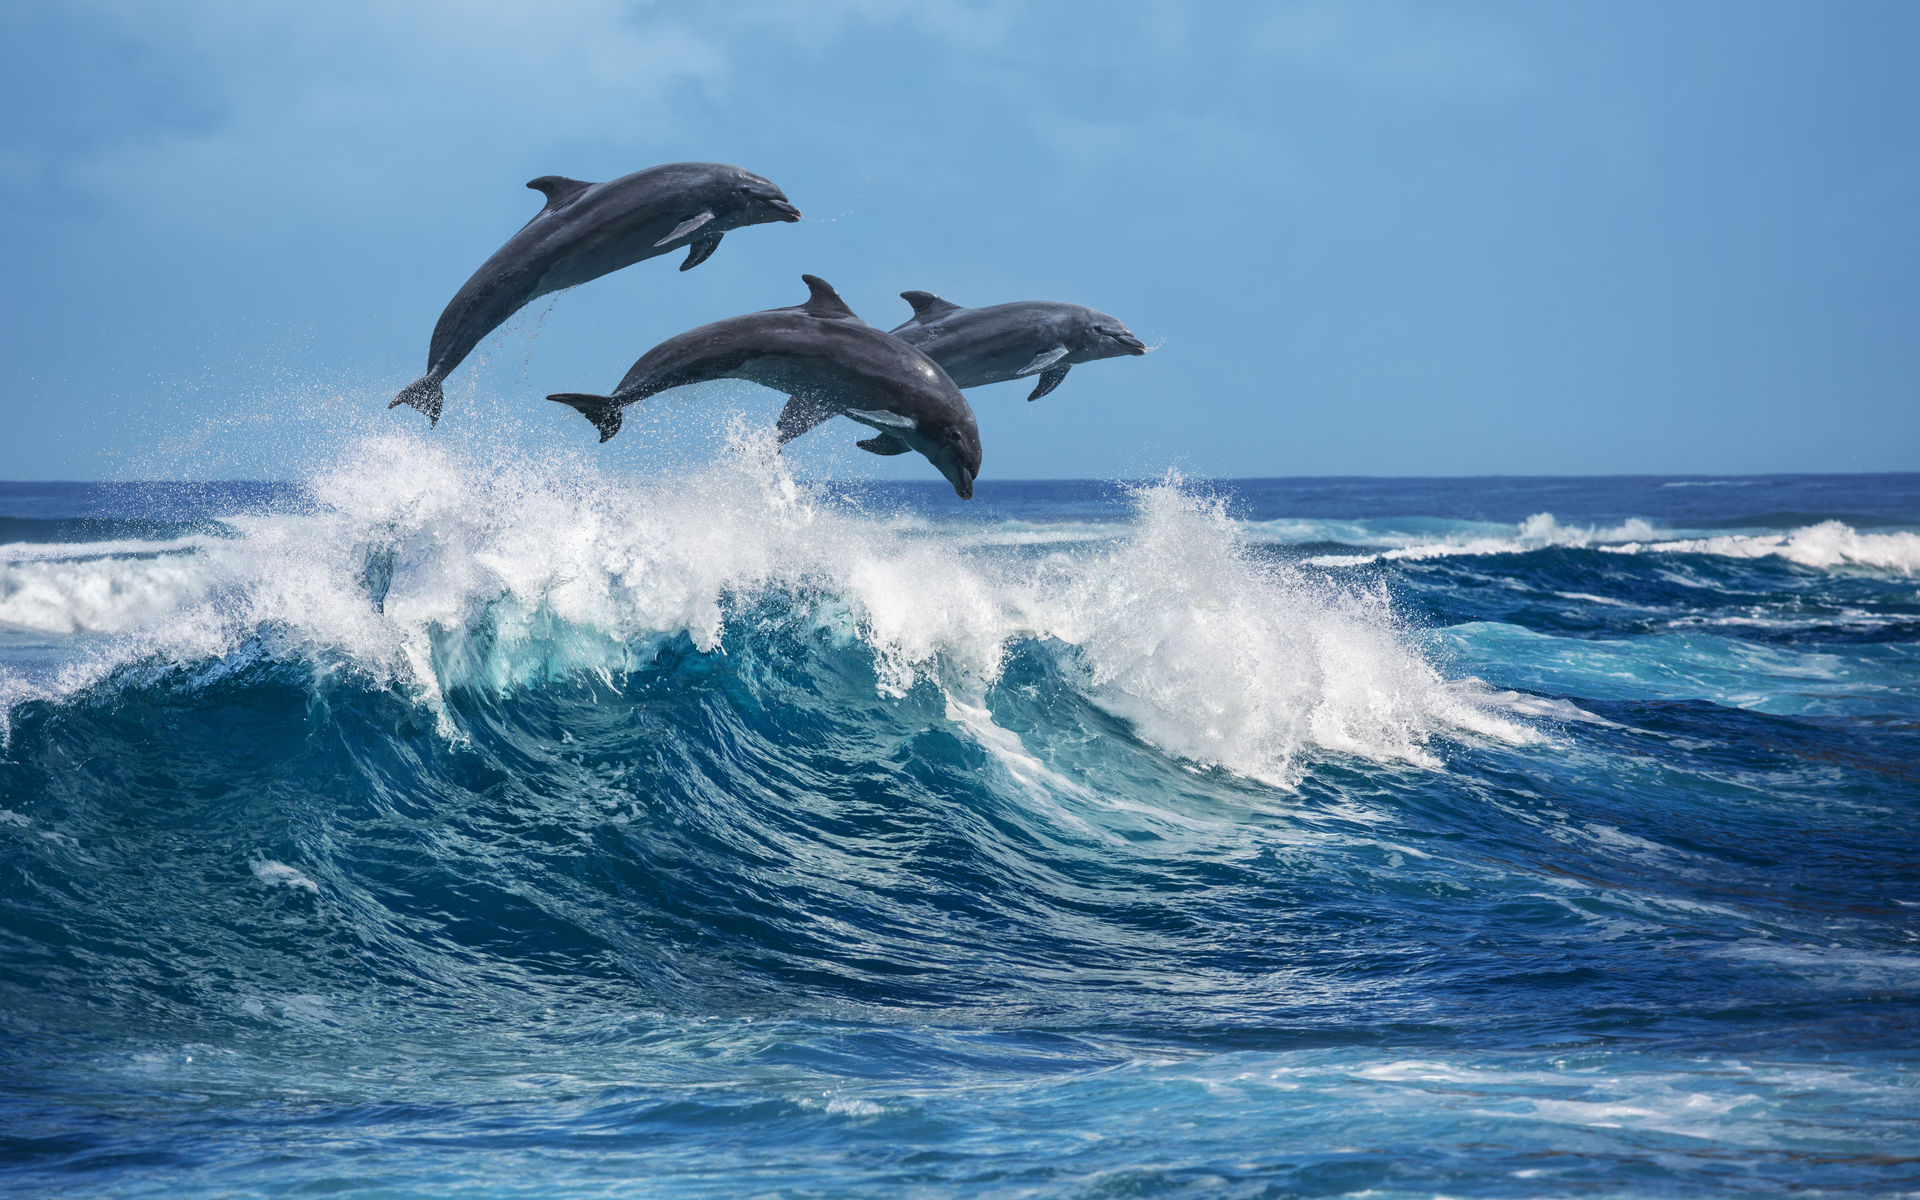 altcoins altcoin binance coin litecoin leo waves dolphins